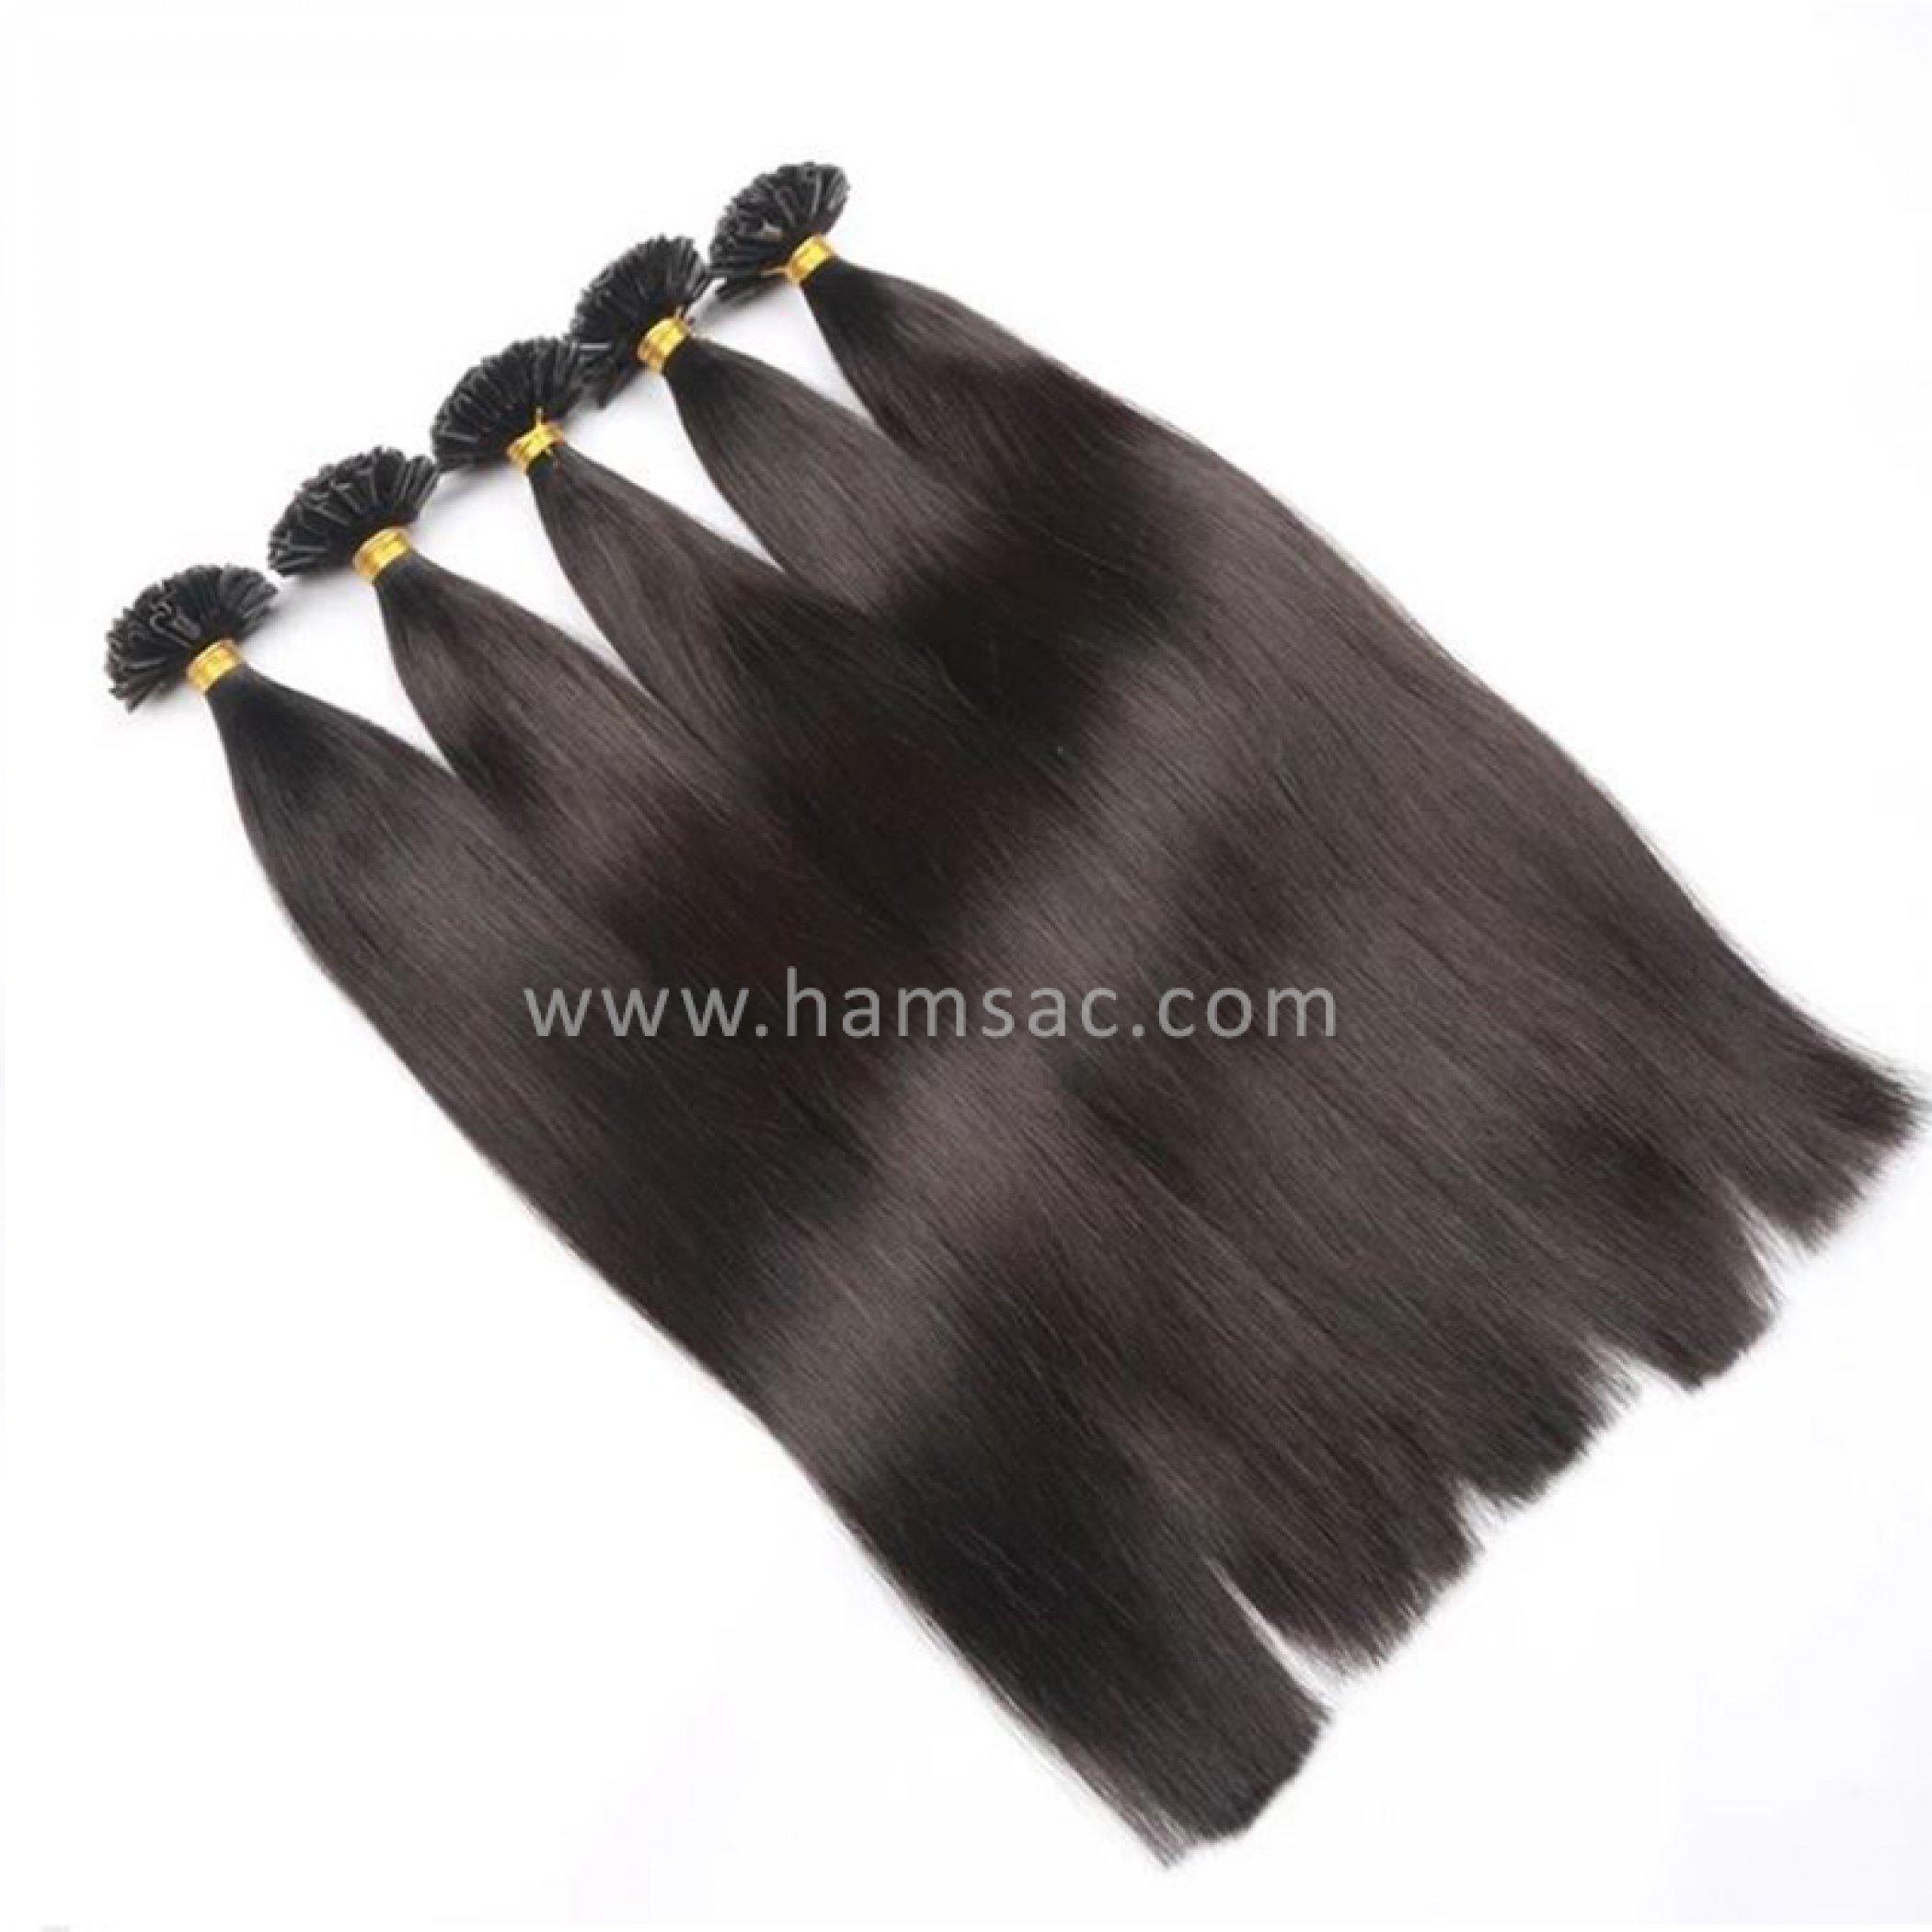 55 cm Doğal Mikro Kaynak Saç